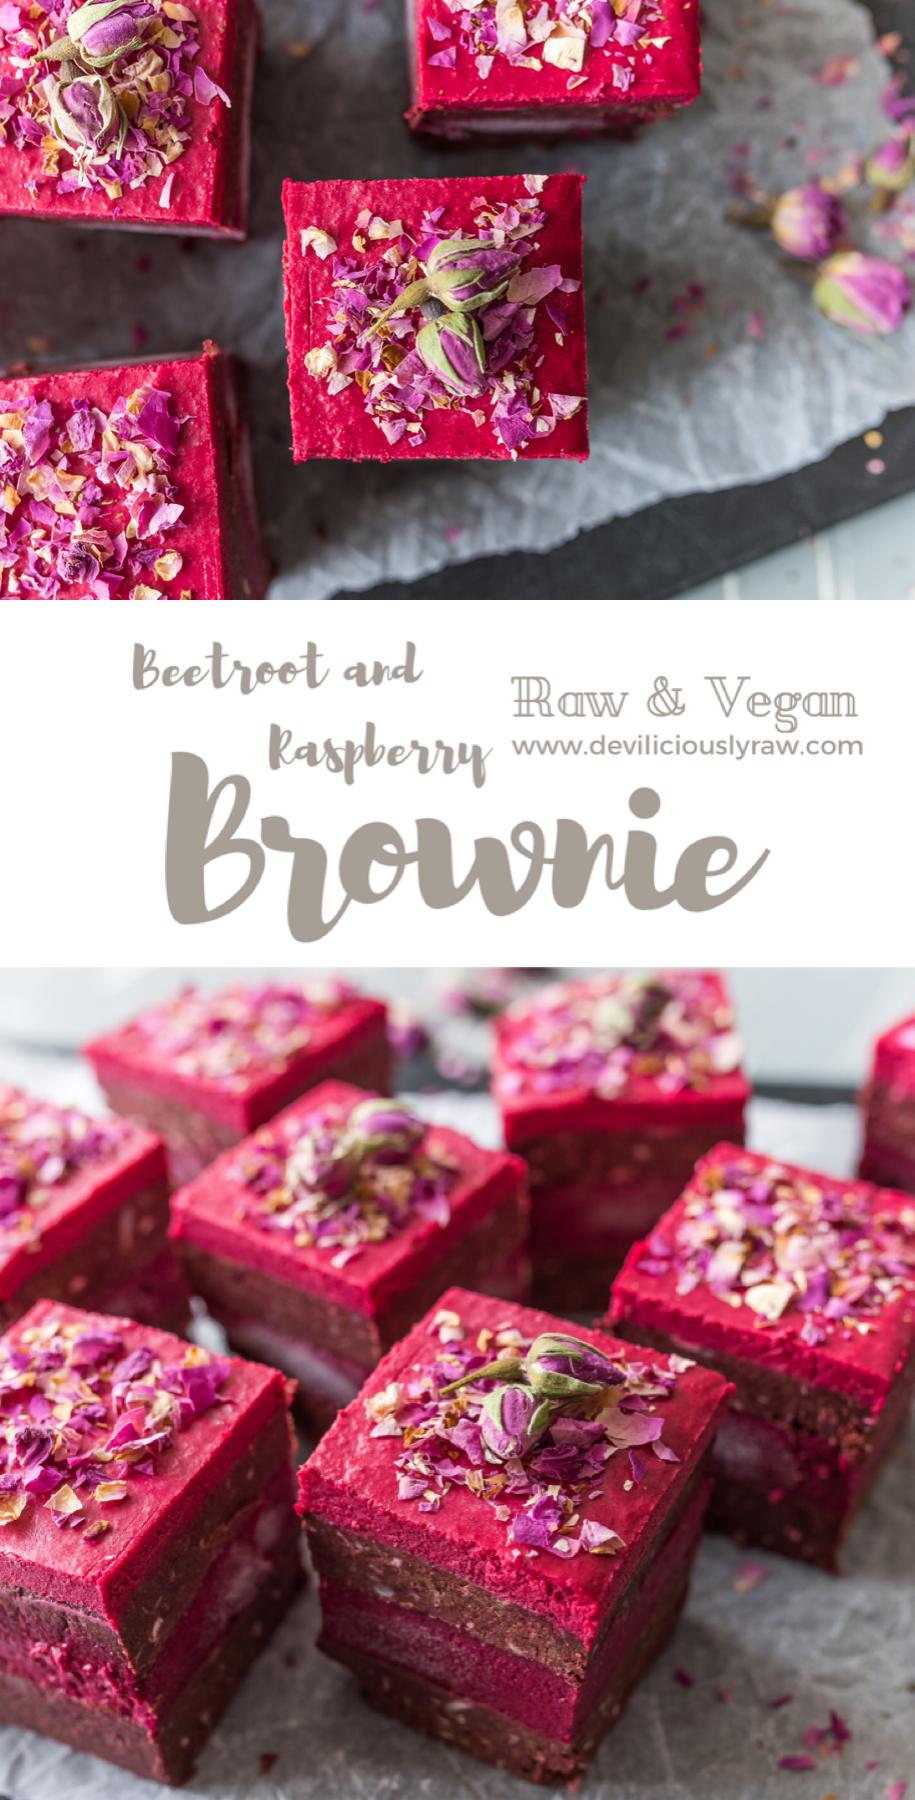 Beetroot and Raspberry Brownie